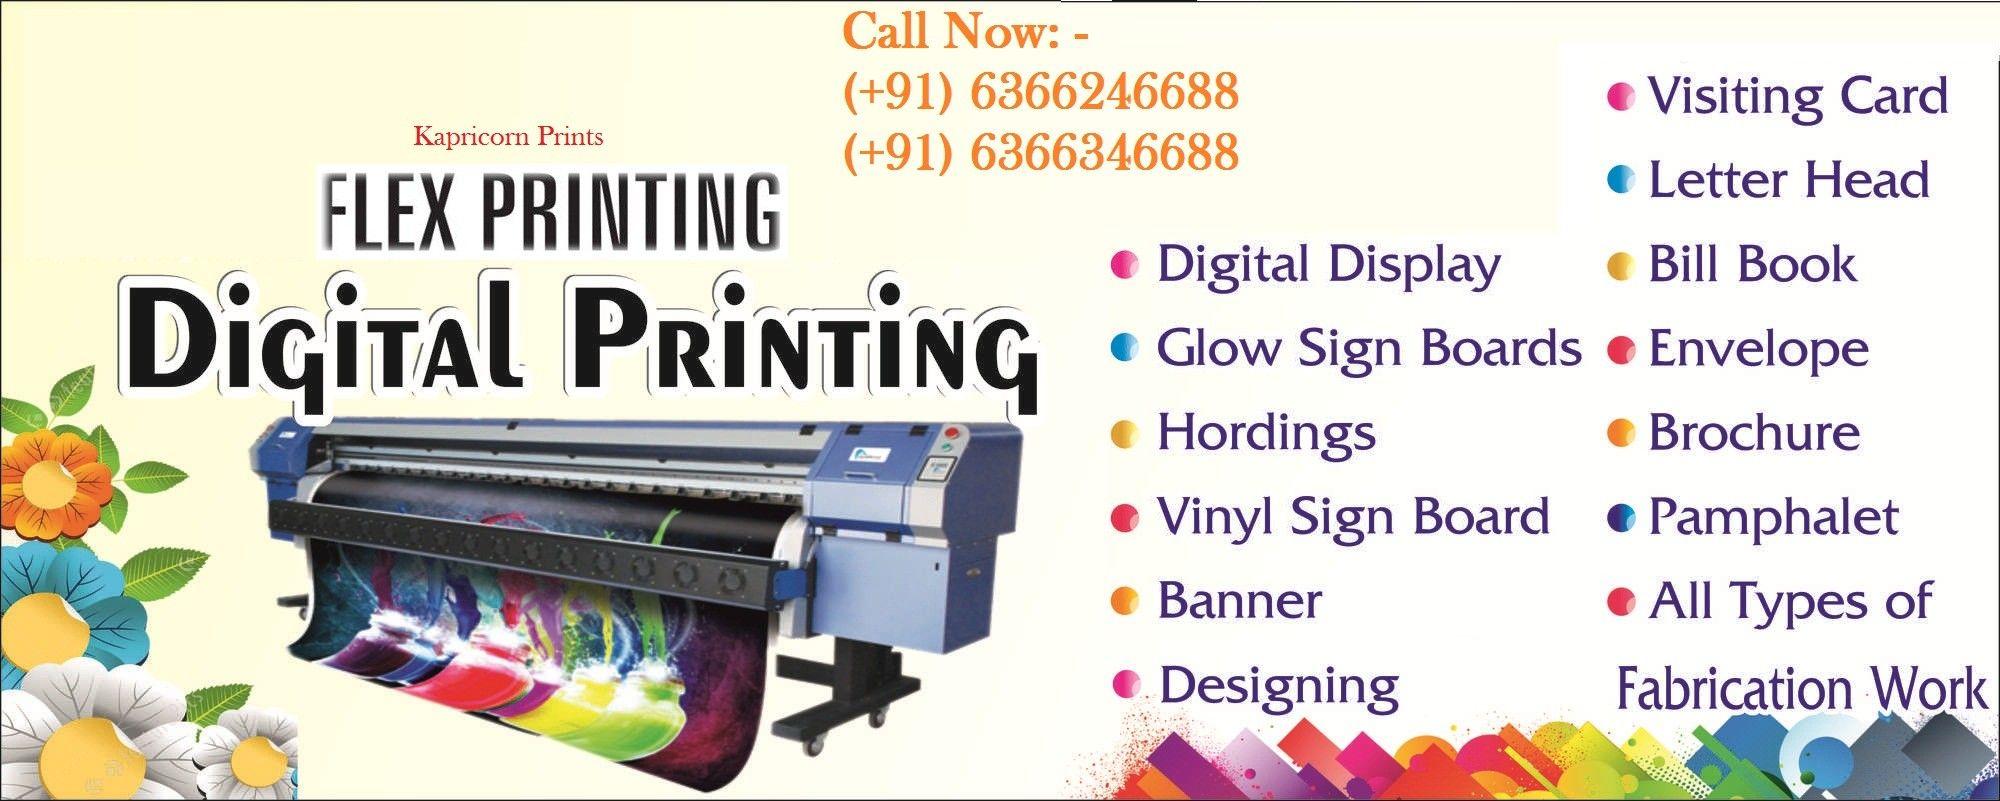 Flex Printing In Bangalore Printing Business Cards Digital Printing Services Banner Printing